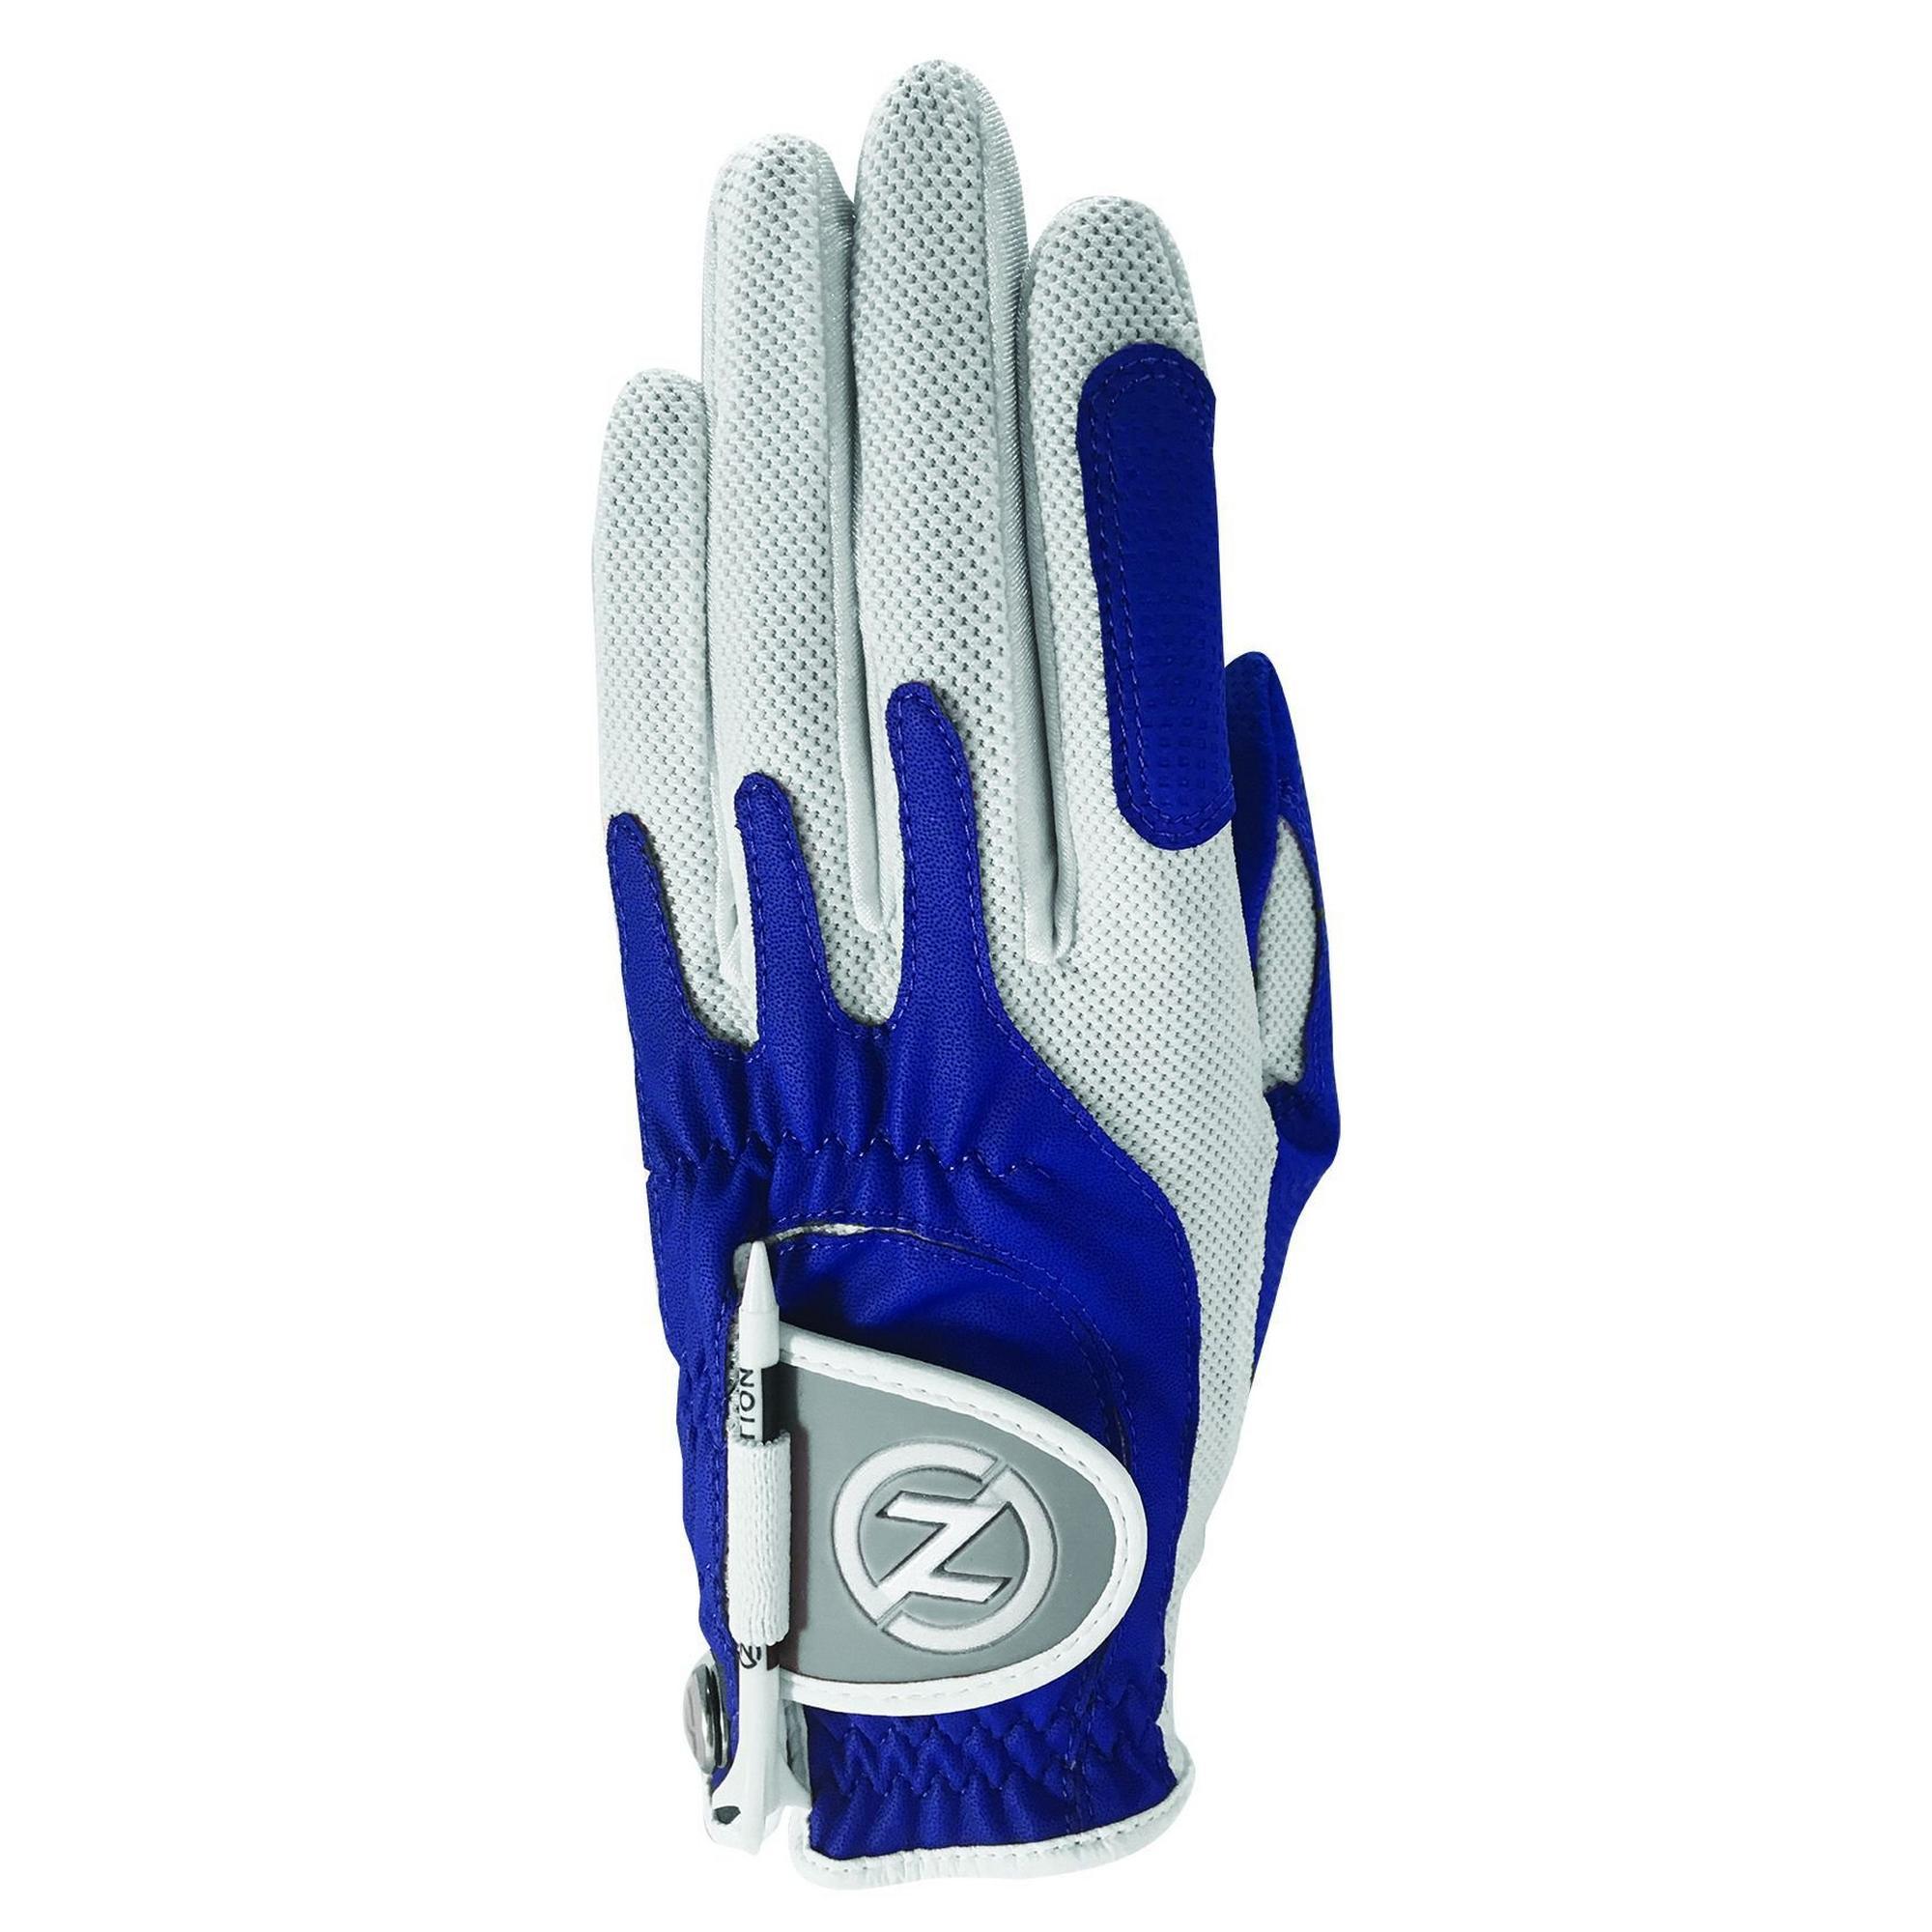 Women's Compression Golf Glove - LLH